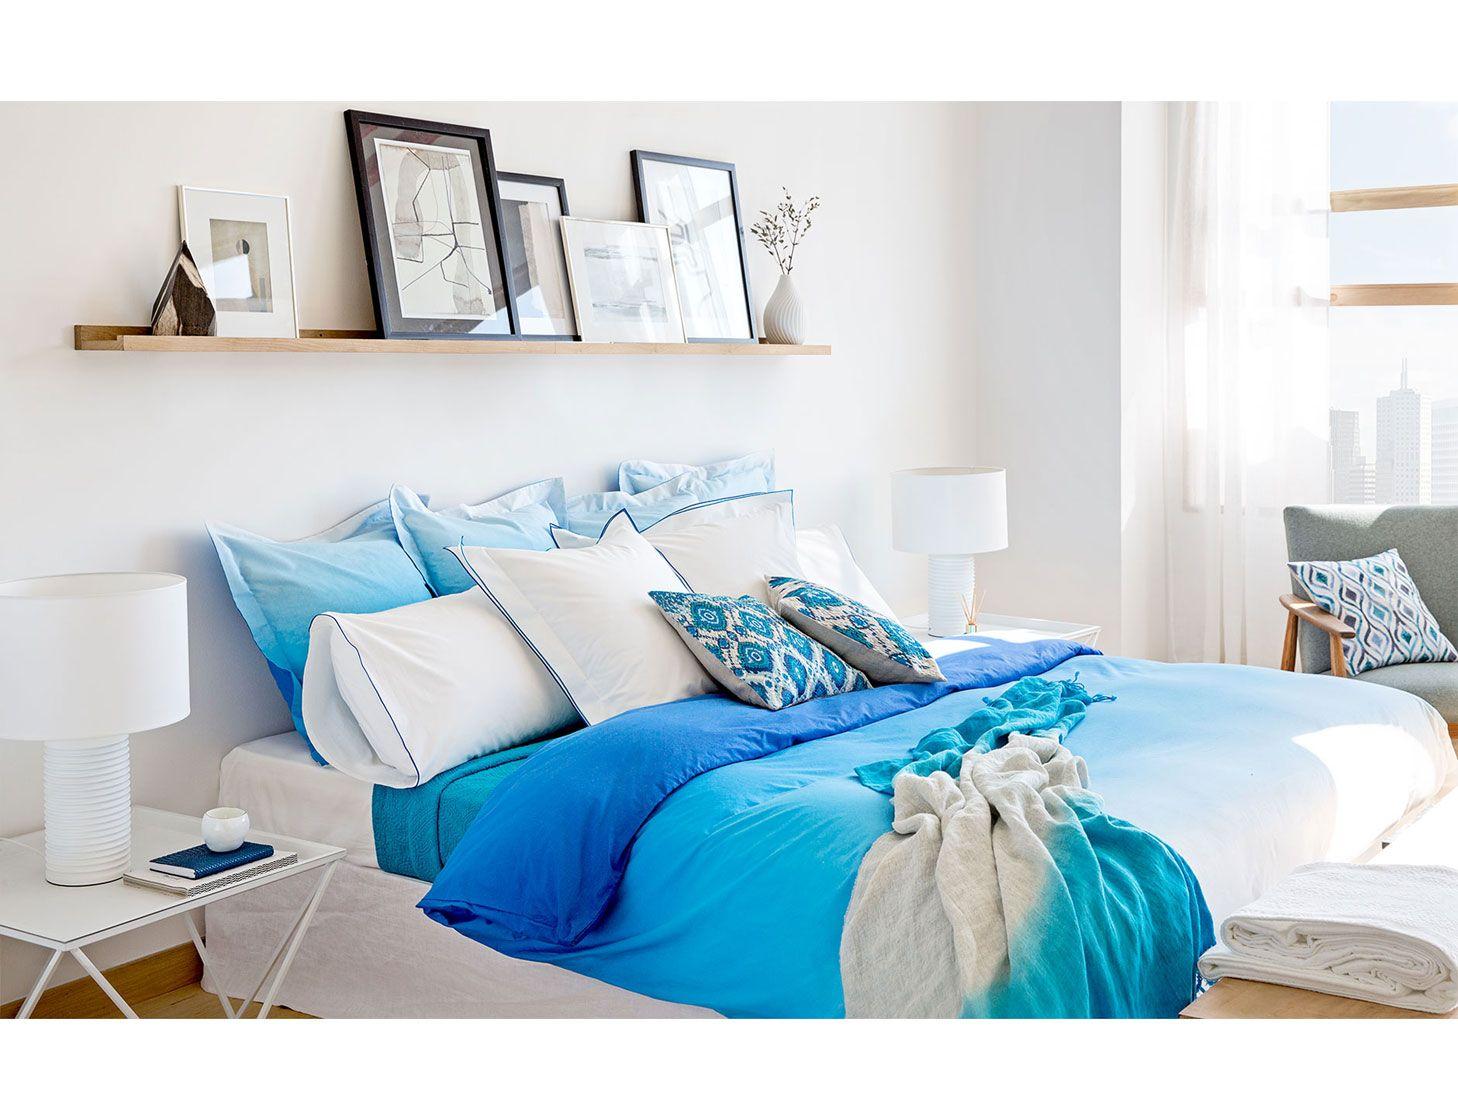 Jaipur lookbook editorials zara home portugal - Zara home portugal ...